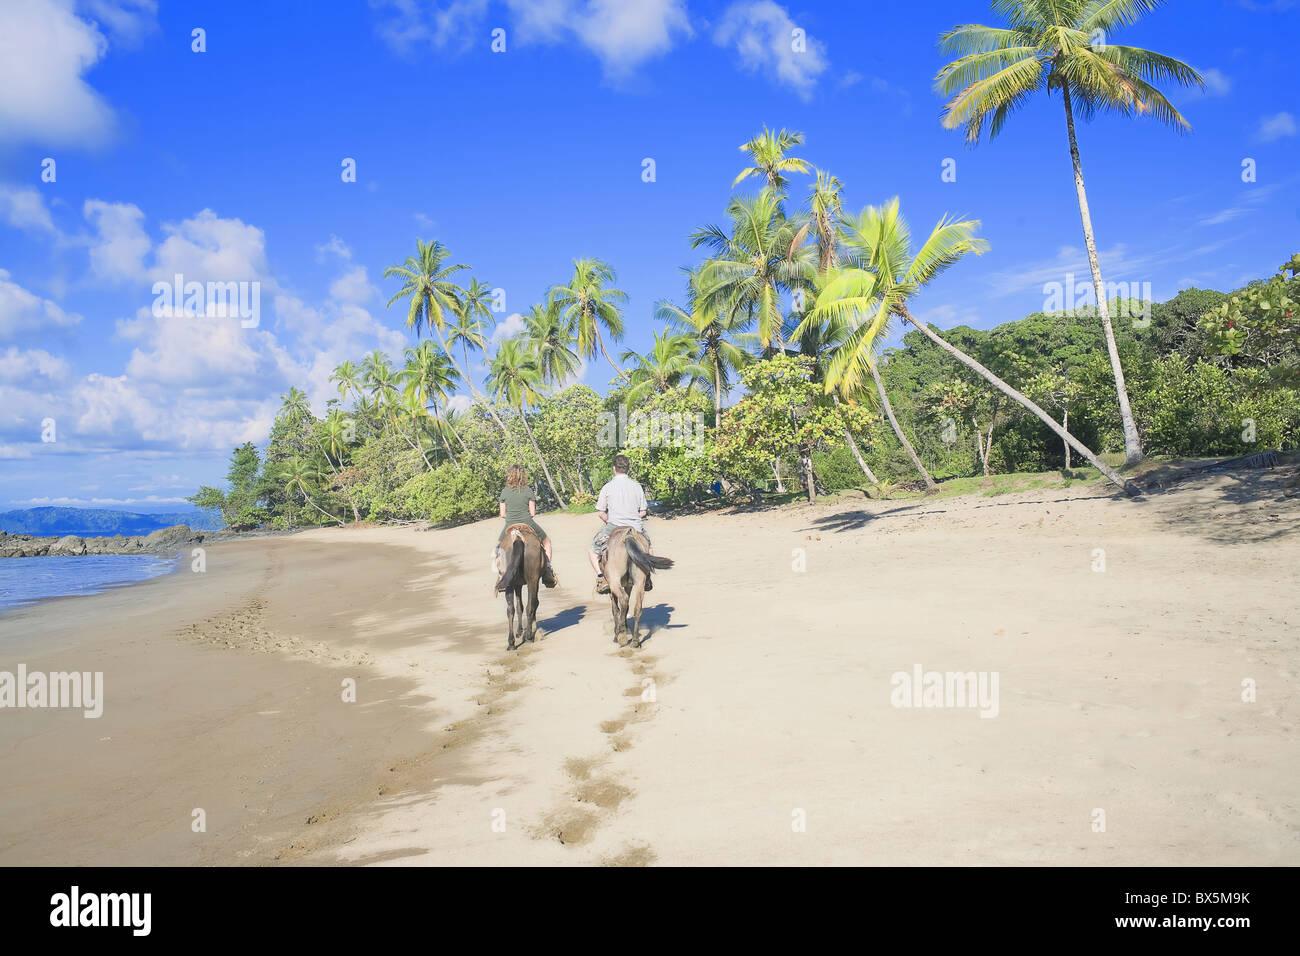 Horseback riding on tropical beach, Baia Drake, Osa Peninsula, Costa Rica, Central America - Stock Image